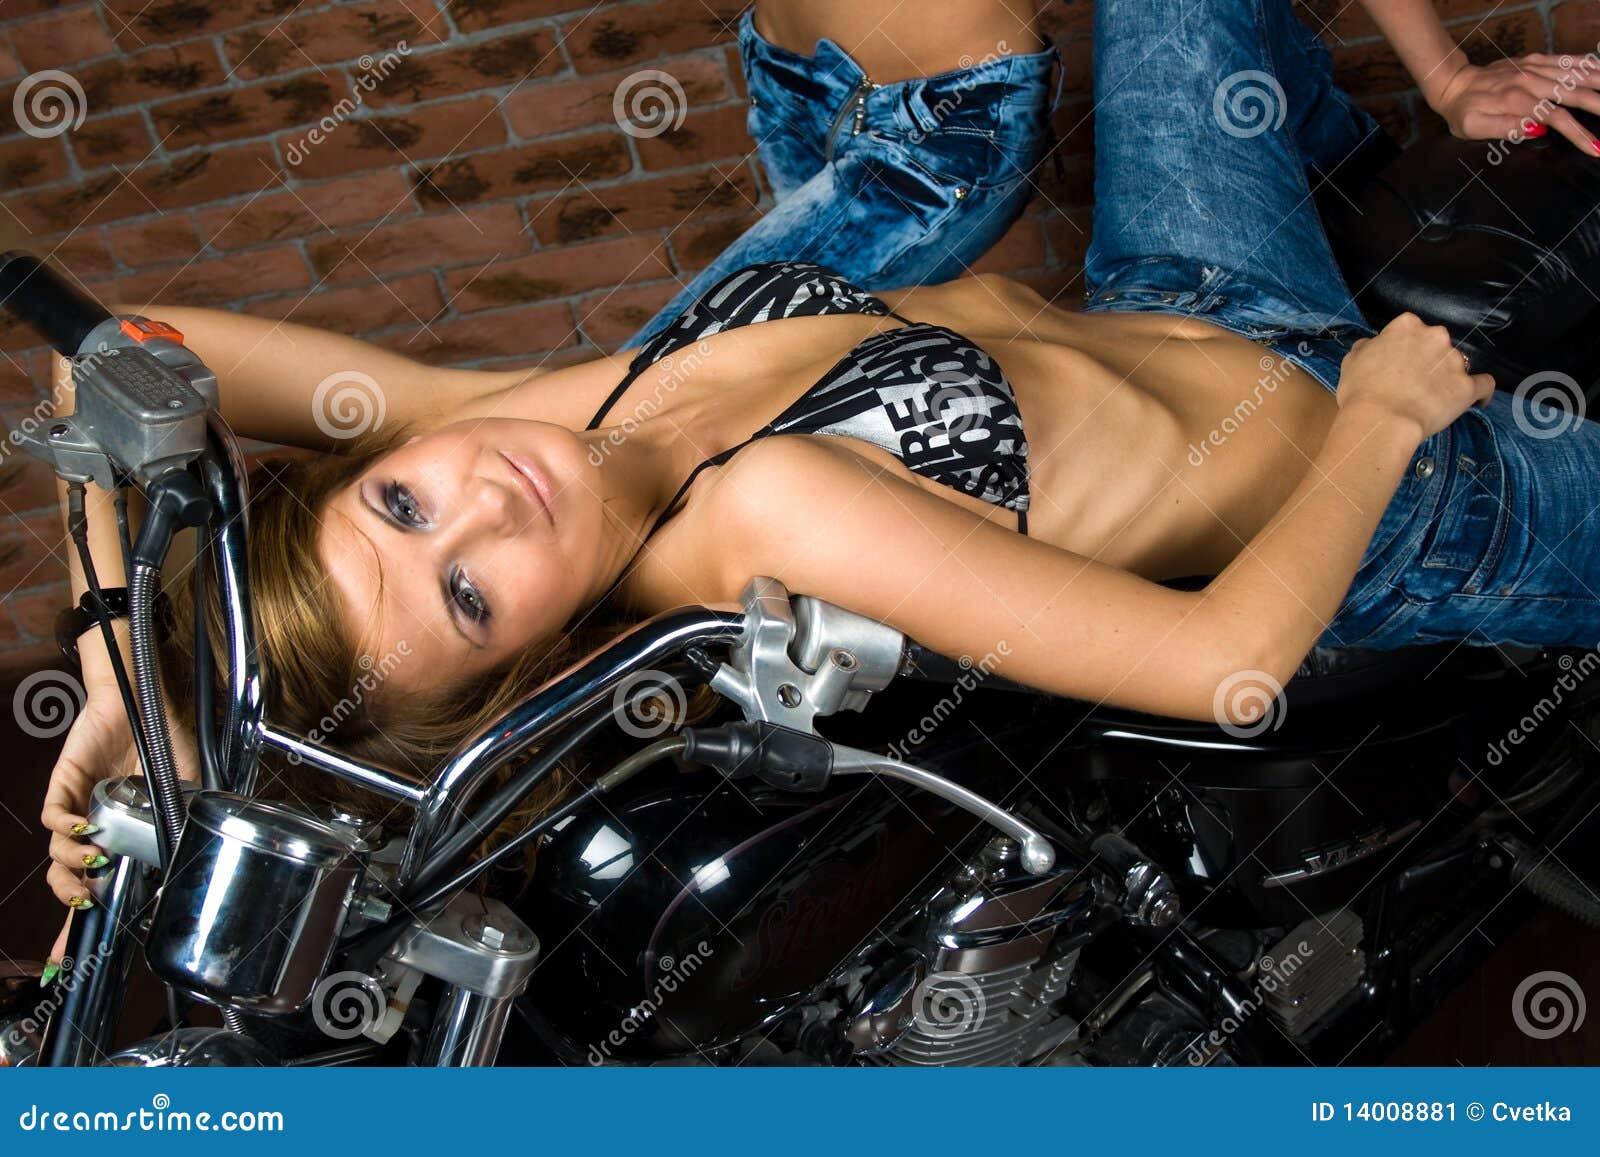 Facebook Mumbaisexgirl Girlfriend Riding Motorcycle Naked